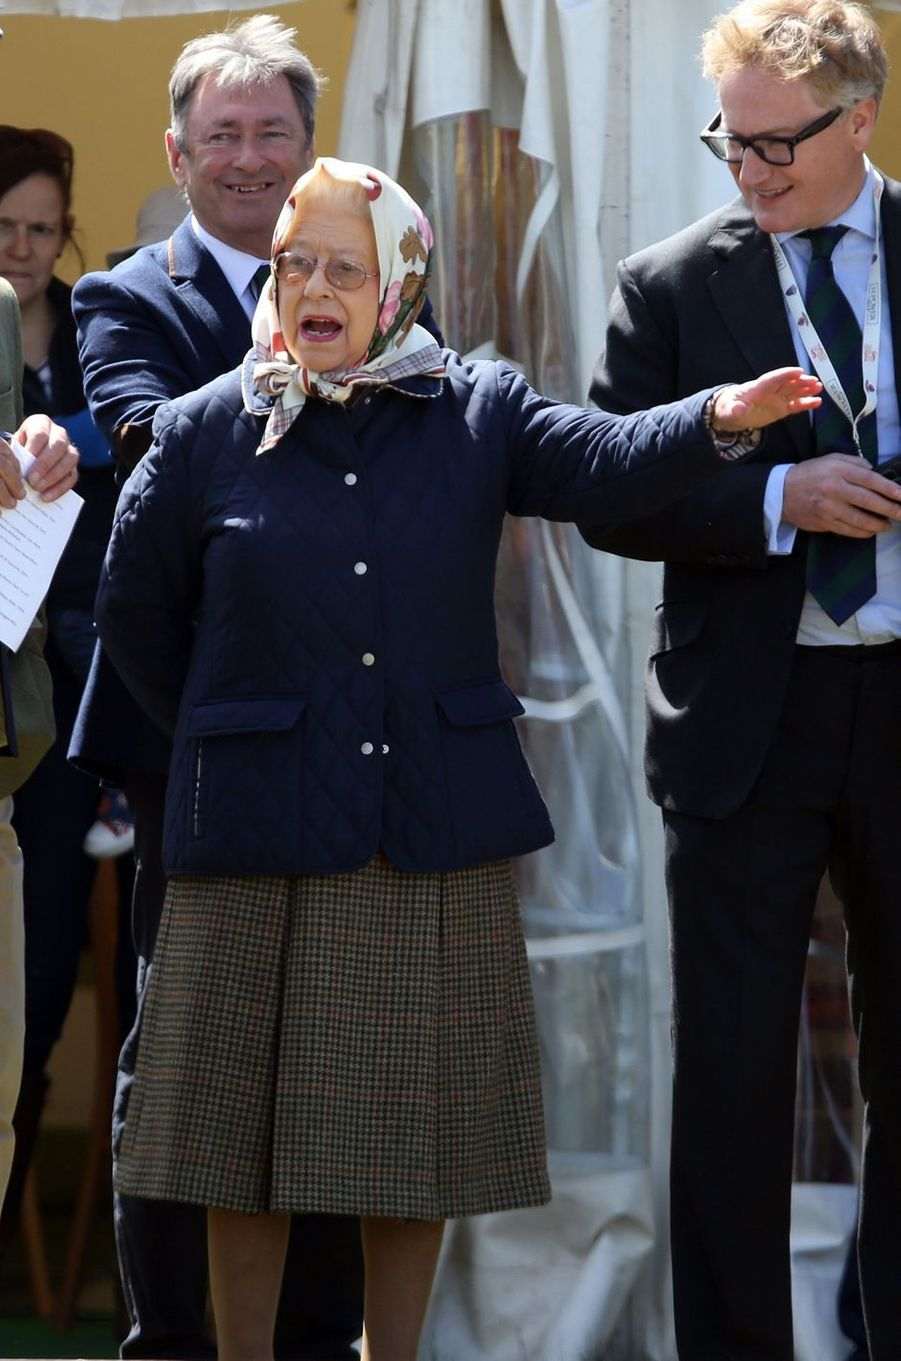 La reine Elizabeth II au Windsor Horse Show, le 10 mai 2017